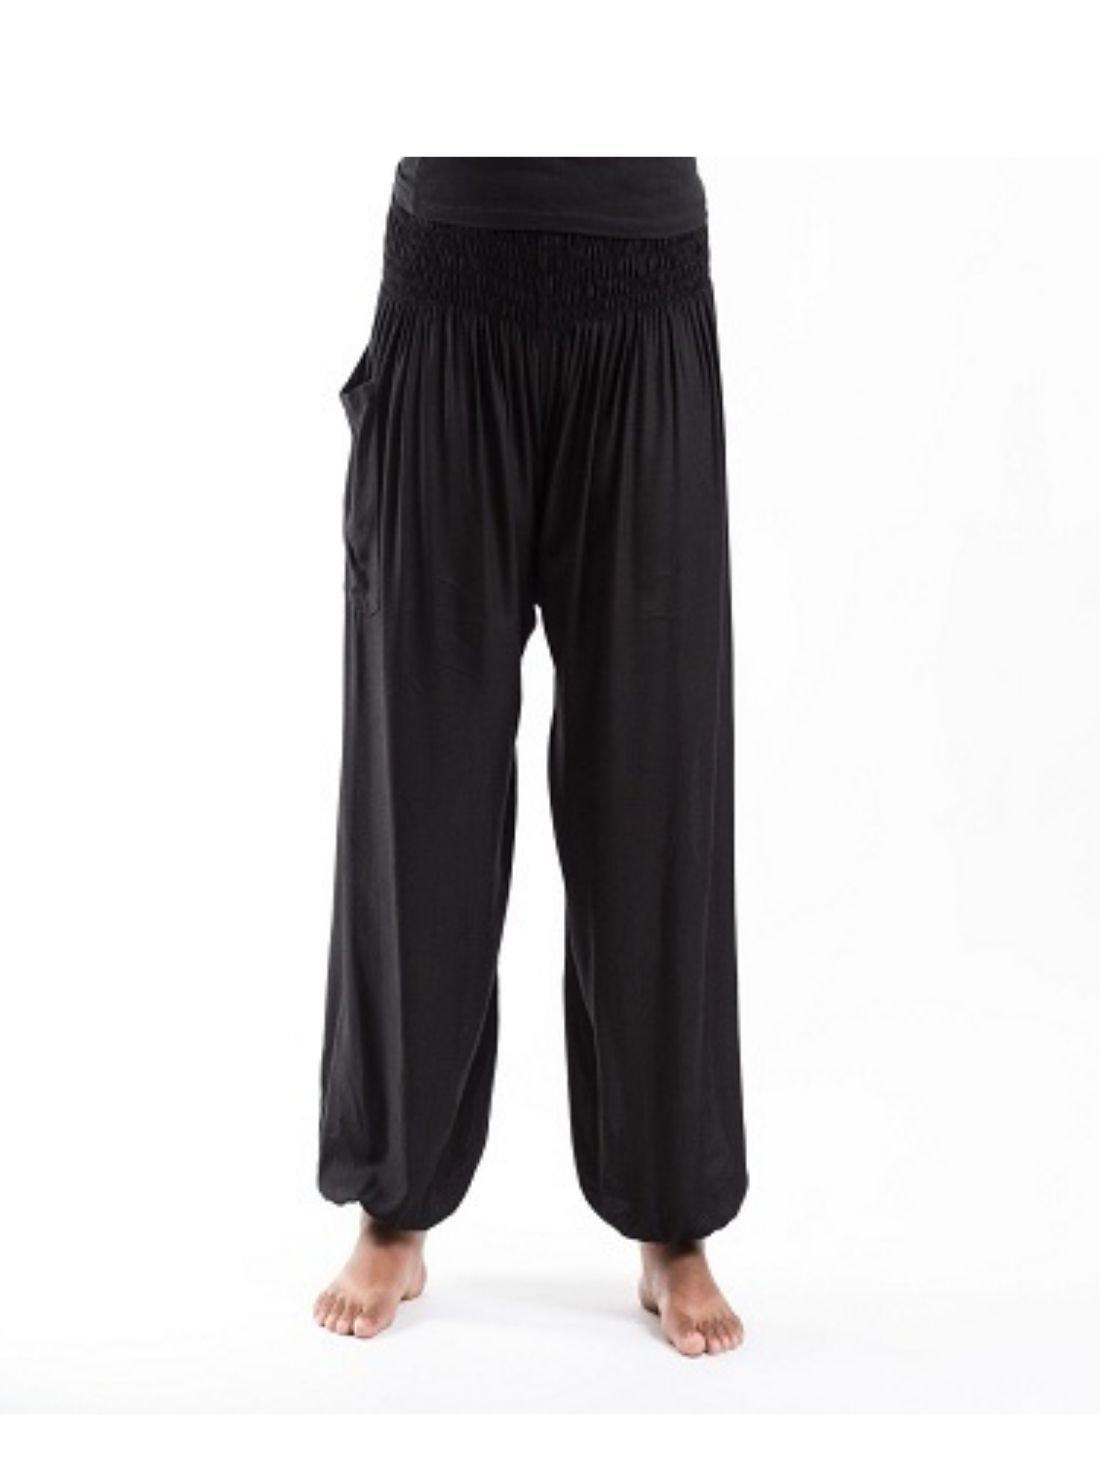 Wholesale Black Rayon Plain Harem Pants